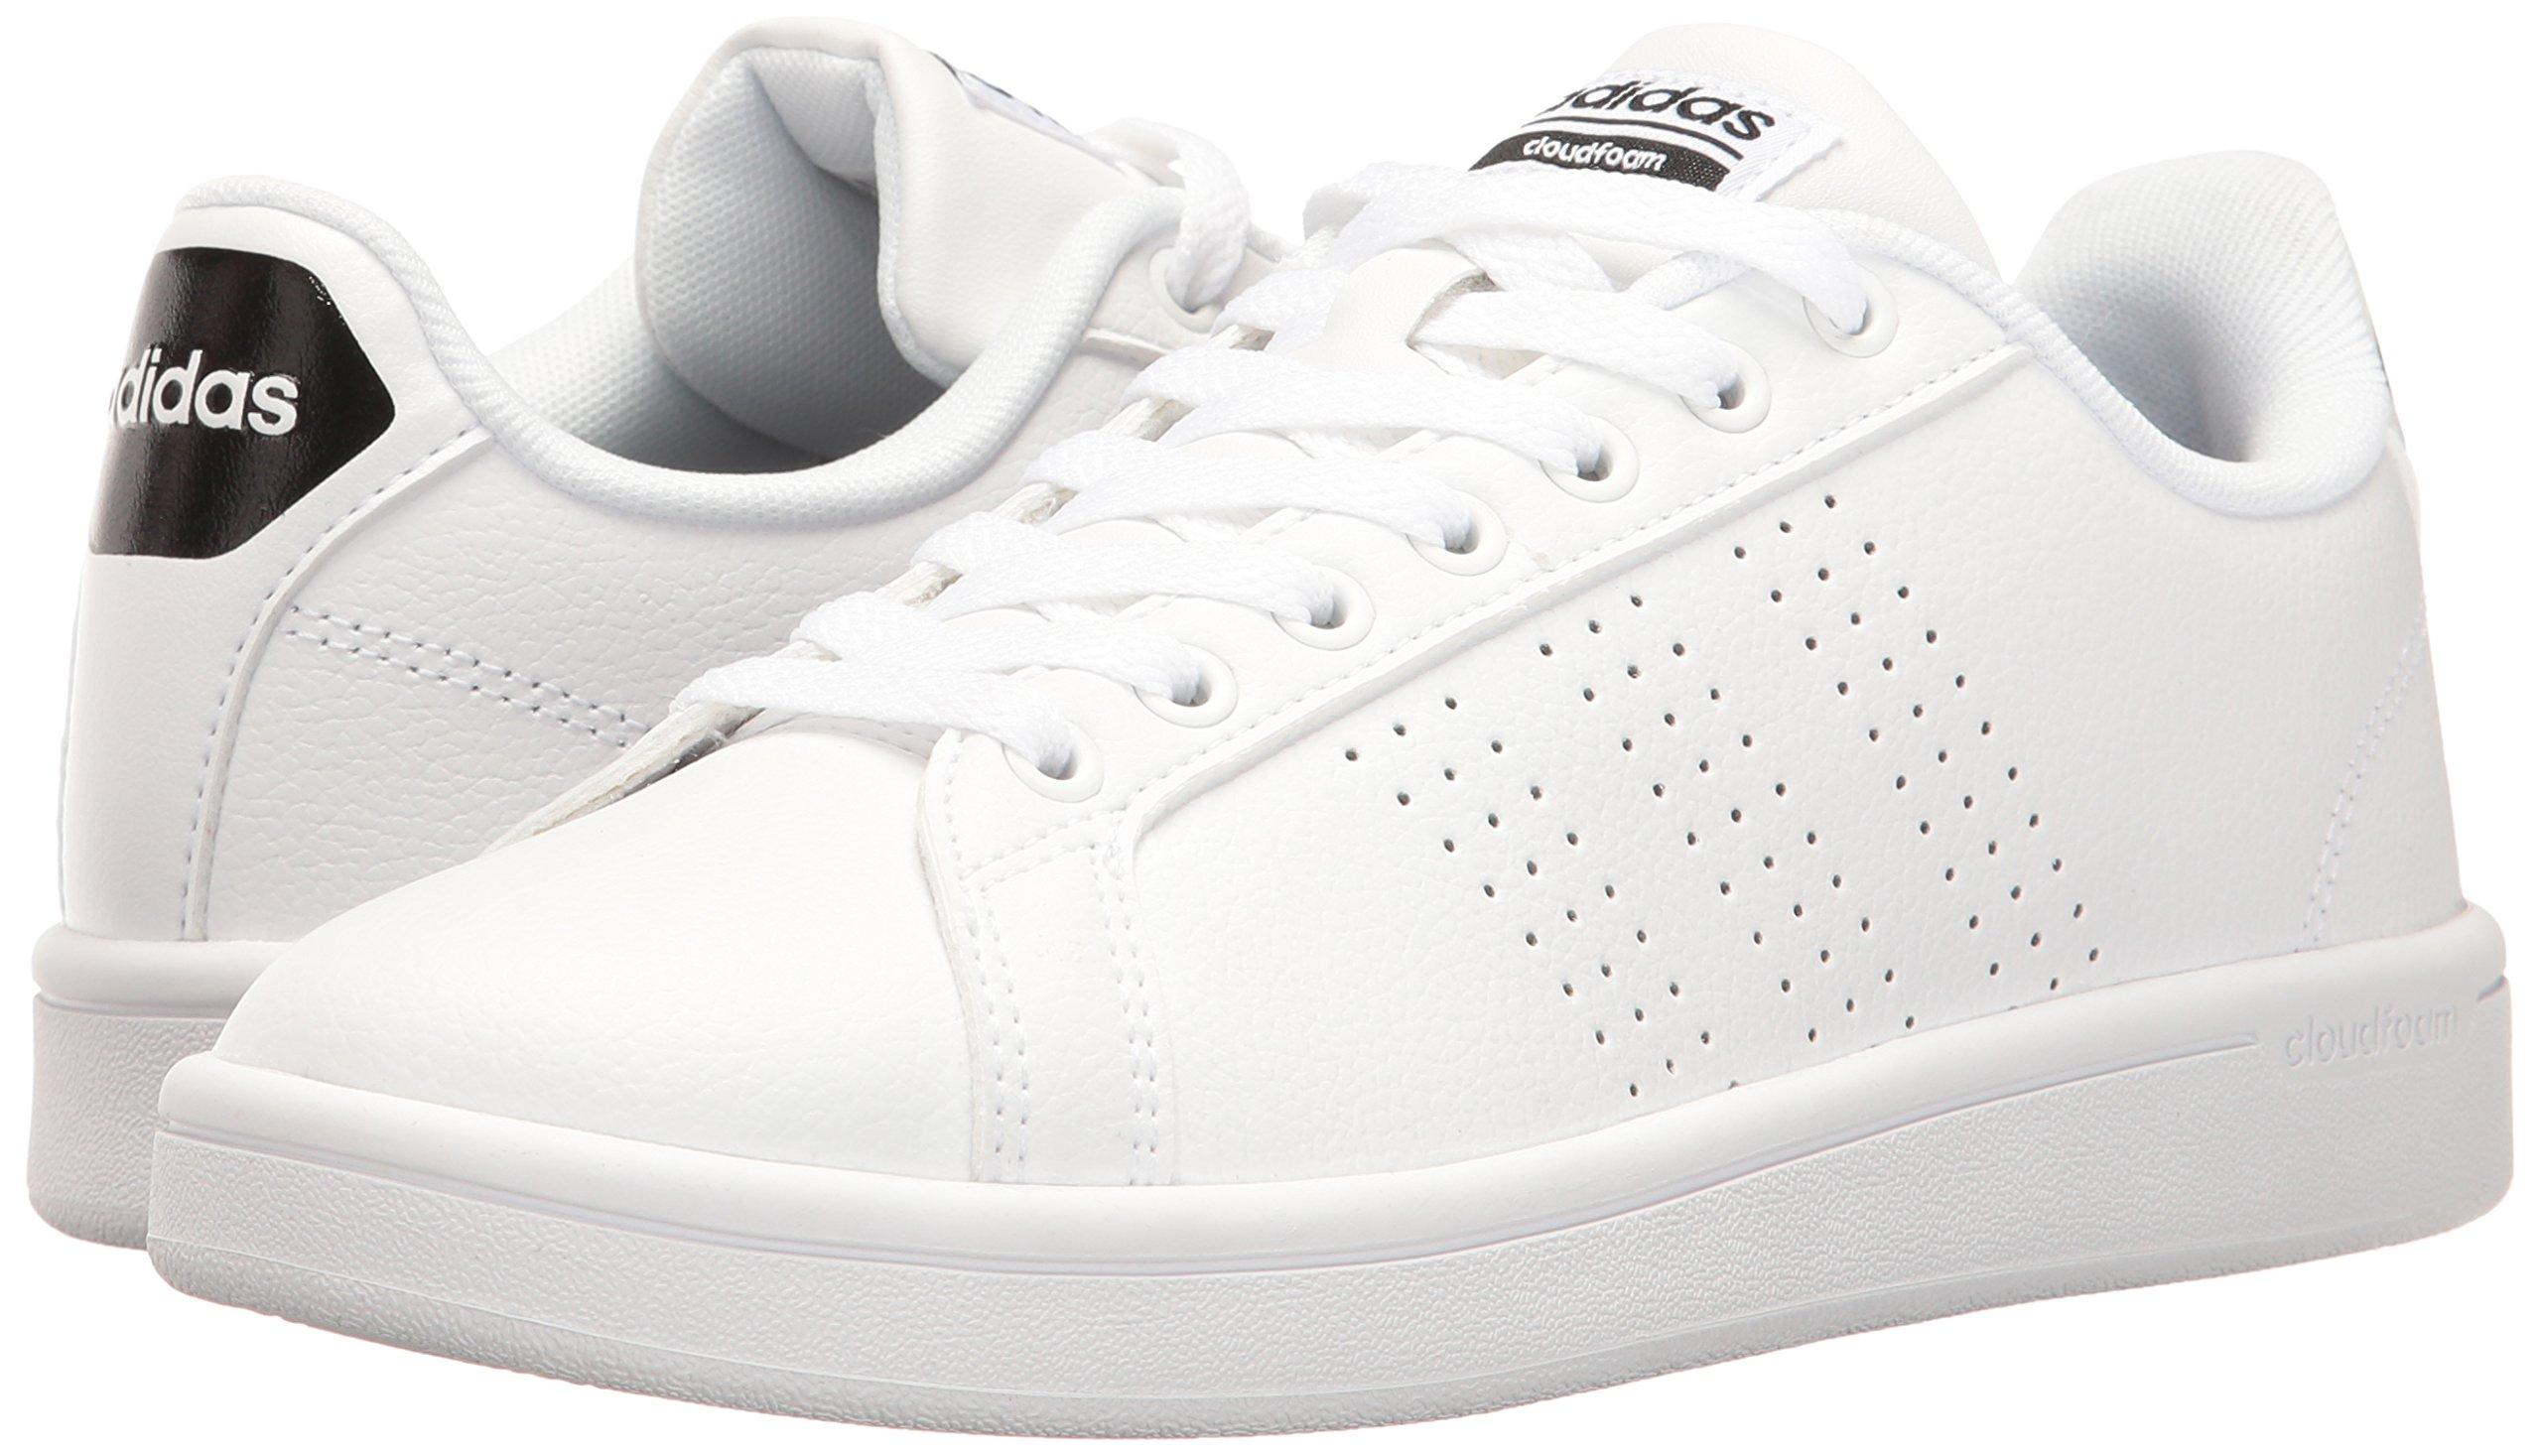 adidas Women's Shoes Cloudfoam Advantage Clean Sneakers, White/White/Black, (7.5 M US) by adidas (Image #6)